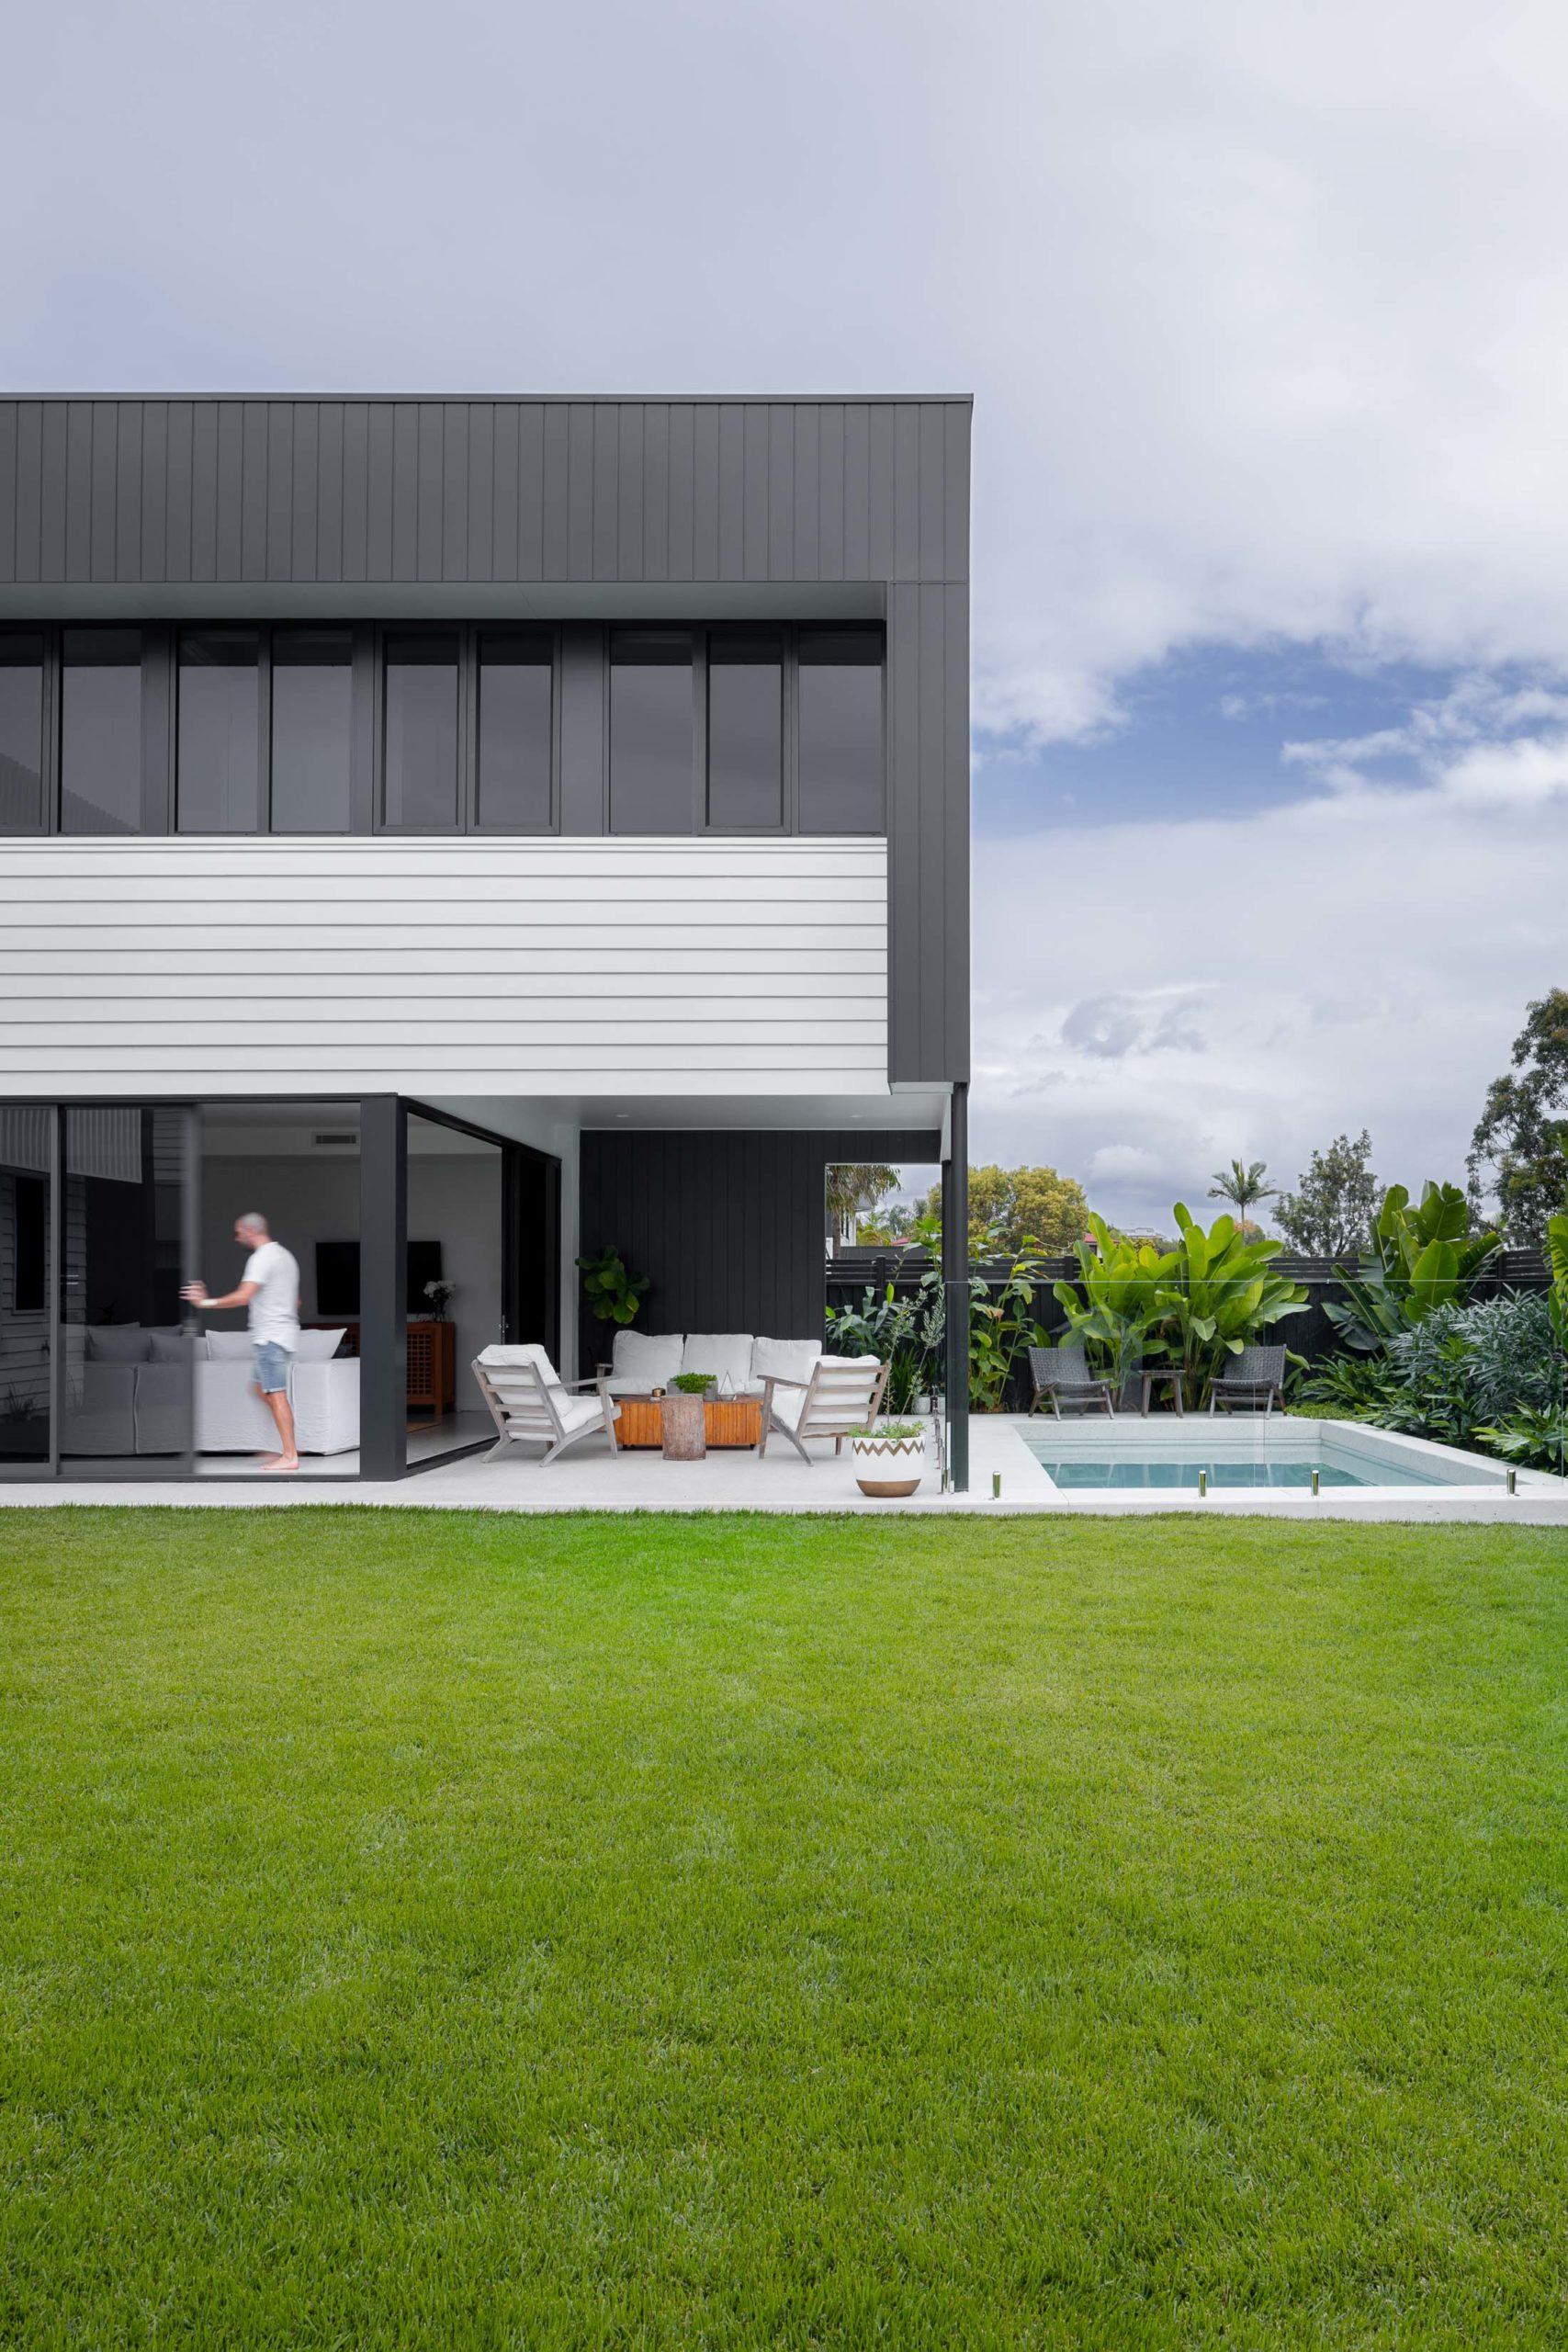 Greeencoast building design